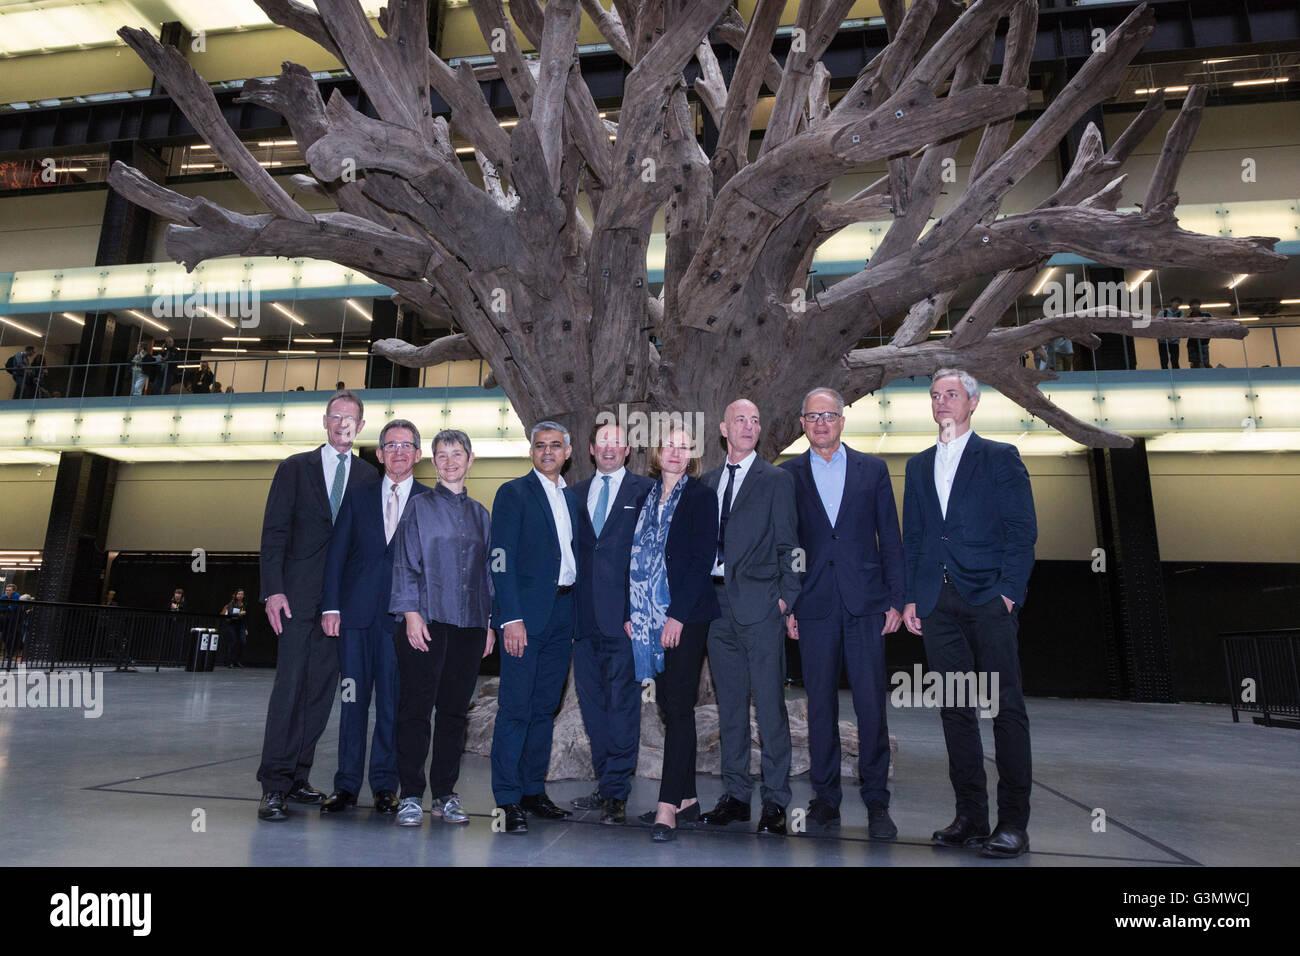 London, UK. 14 June 2016. L-R: Sir Nicholas Serota, Lord Browne, Frances Morris, Sadiq Khan, Ed Vaizey, Kerstin - Stock Image